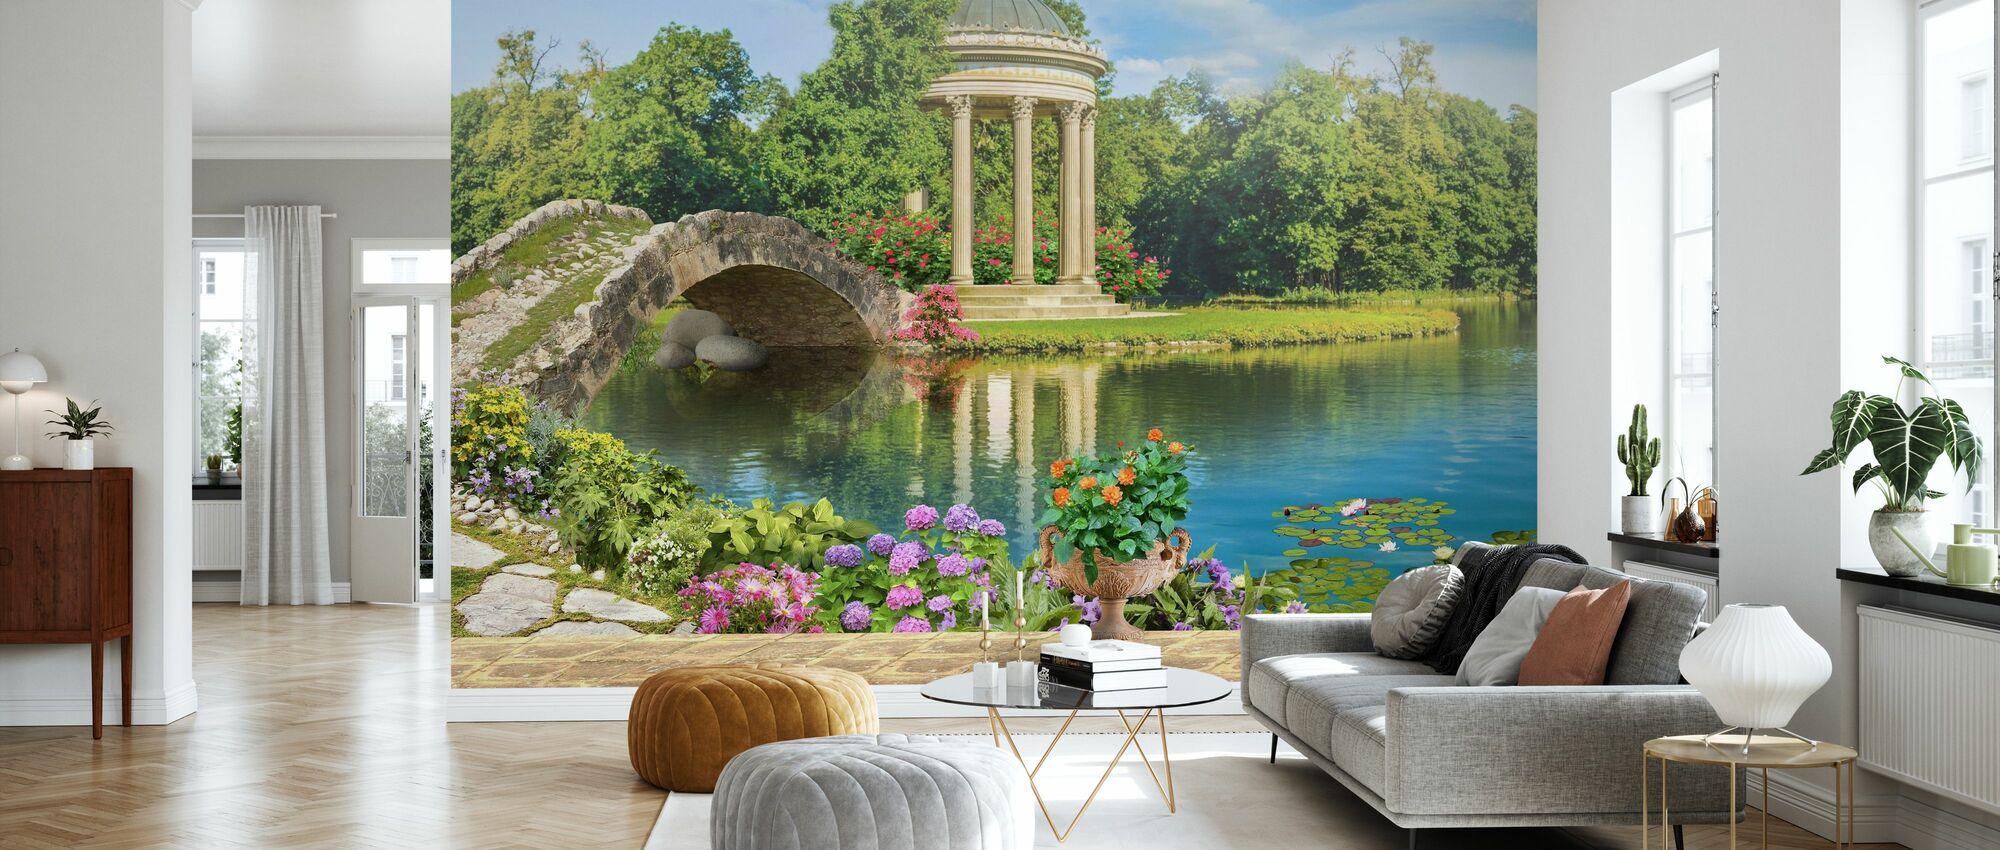 Swans in Pond - Wallpaper - Living Room